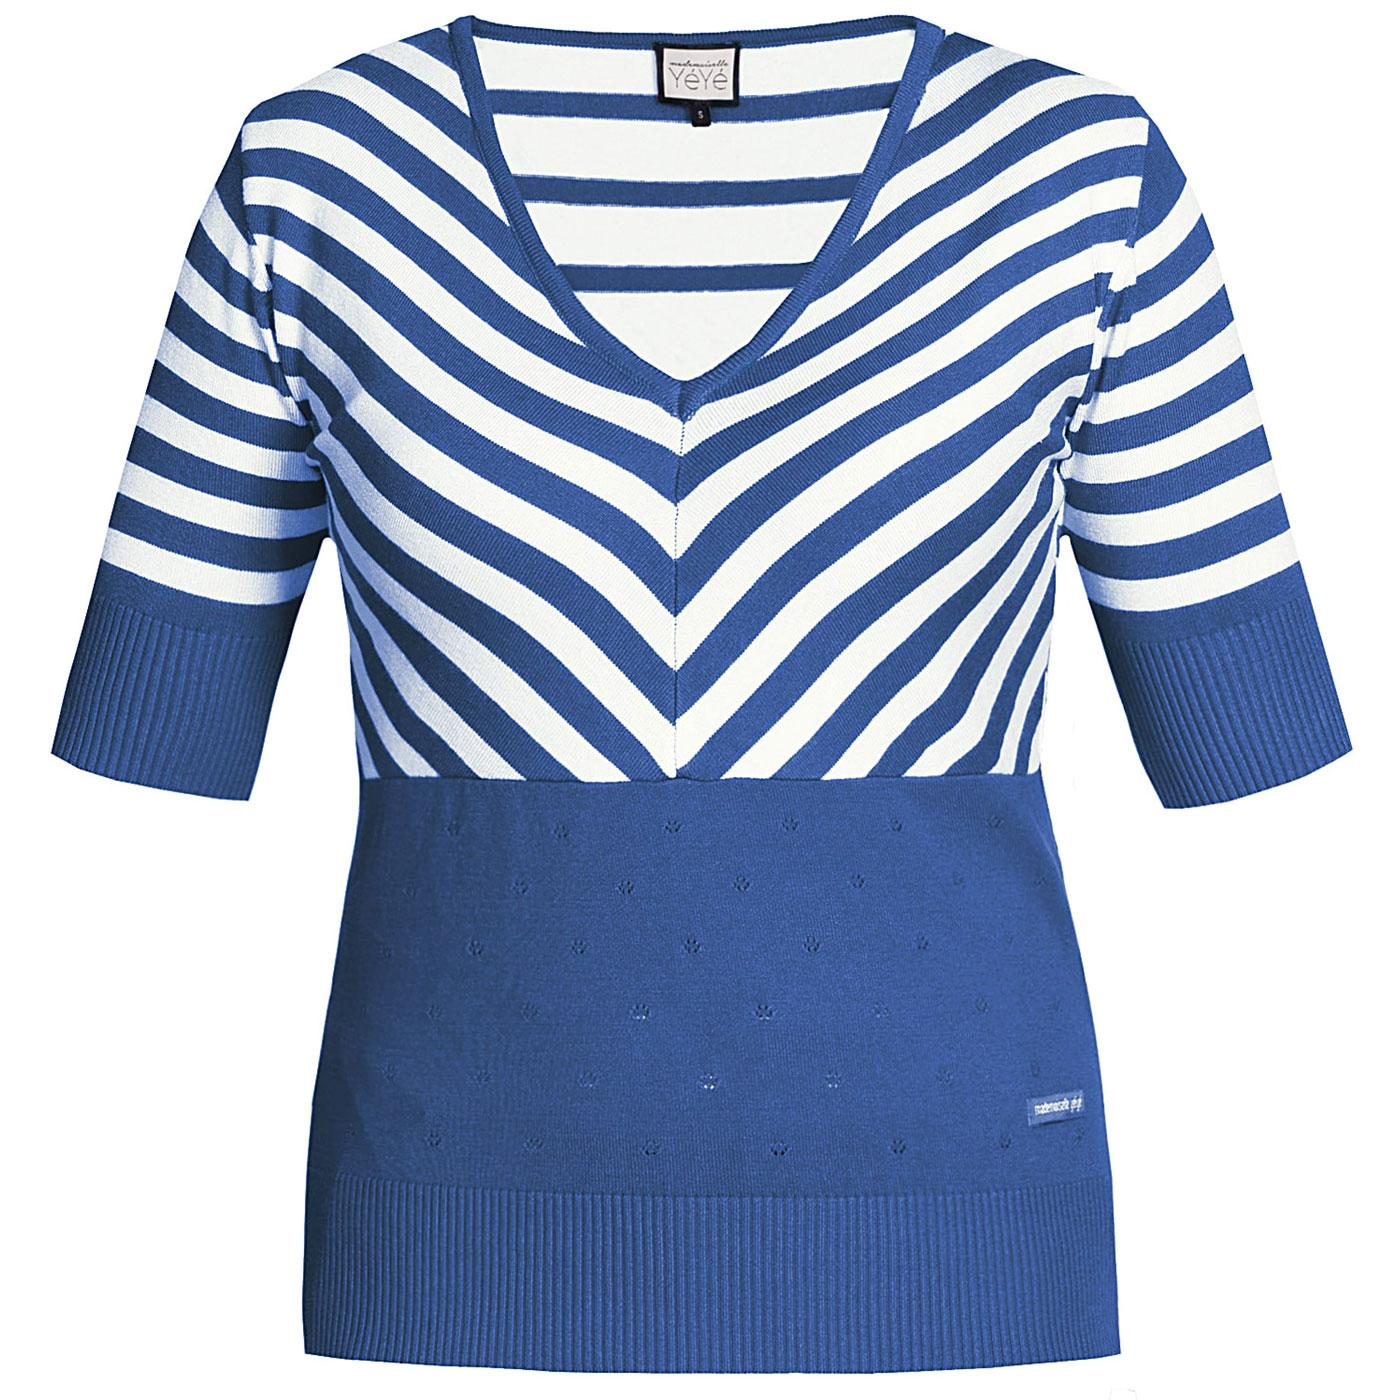 Stripes Lover MADEMOISELLE YEYE Retro 60s Top Blue